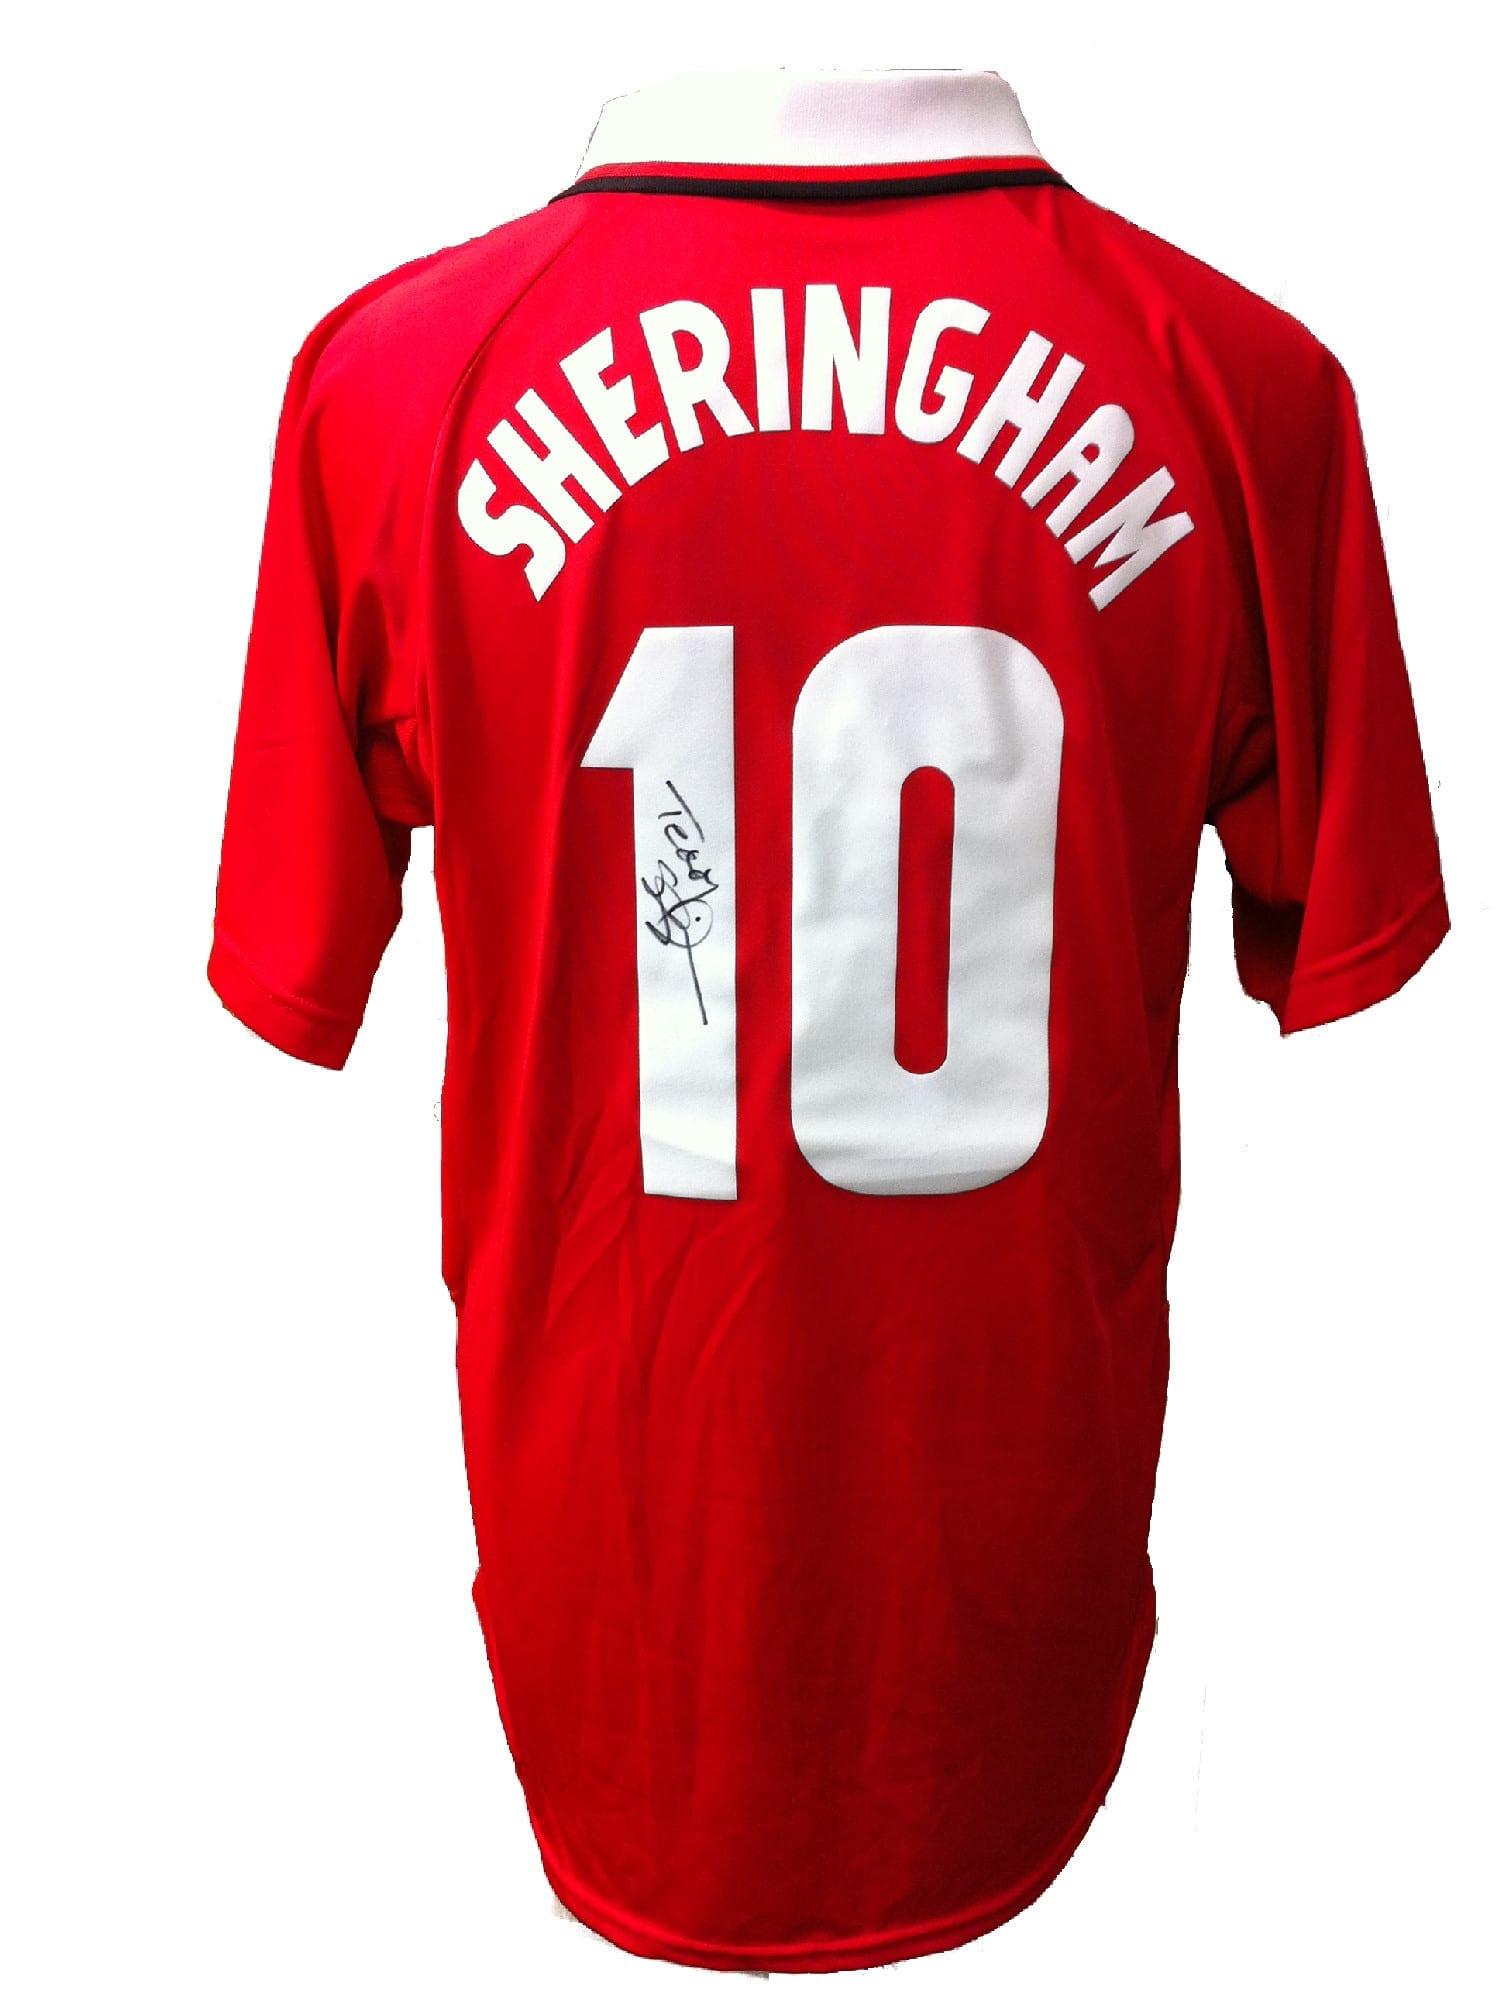 Sheringham till manchester u